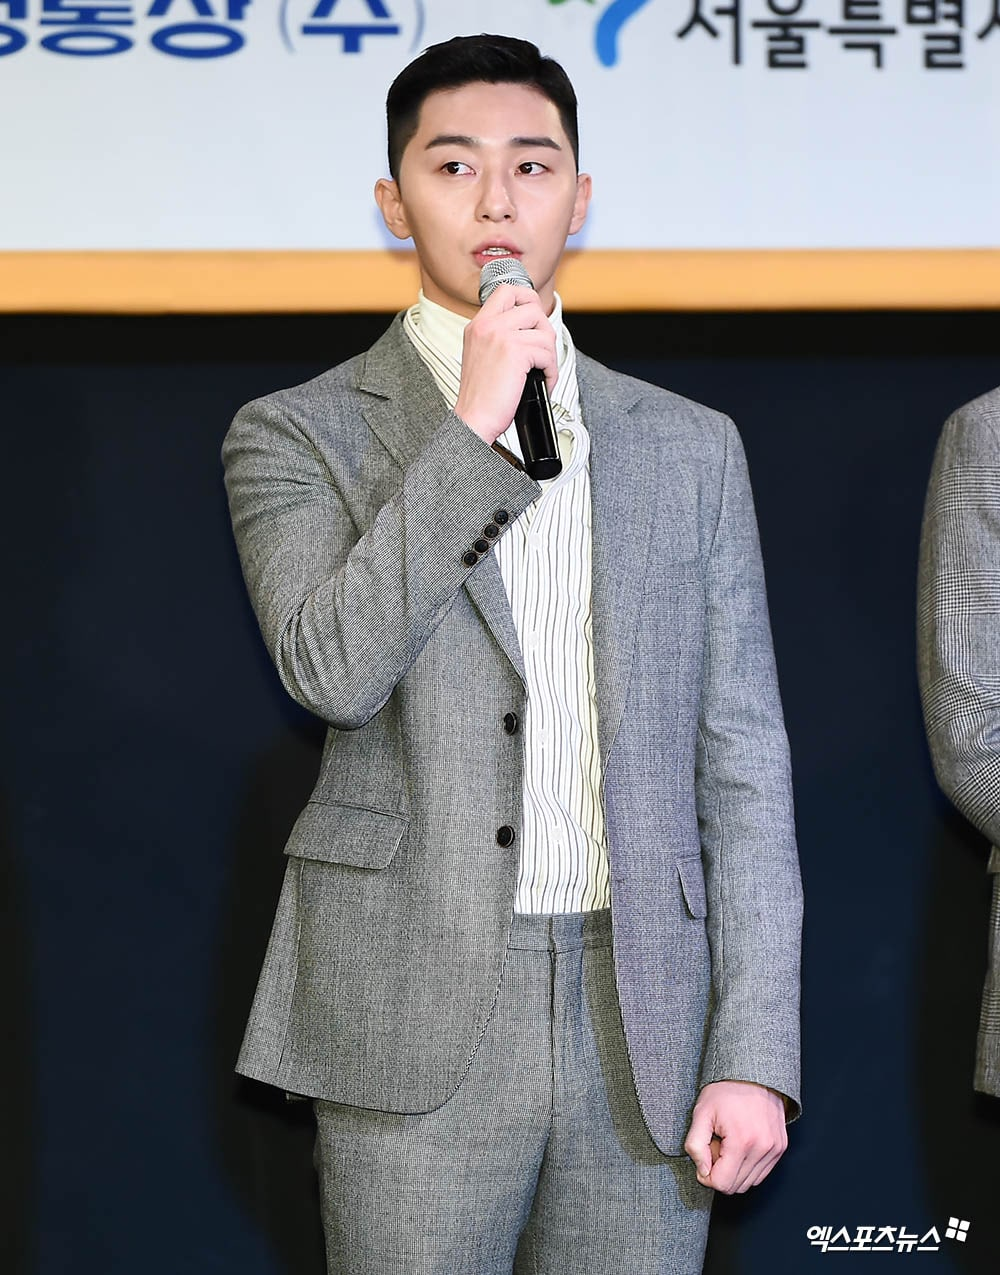 https://0.soompi.io/wp-content/uploads/2019/11/14193433/Park-Seo-Joon-xpn.jpg